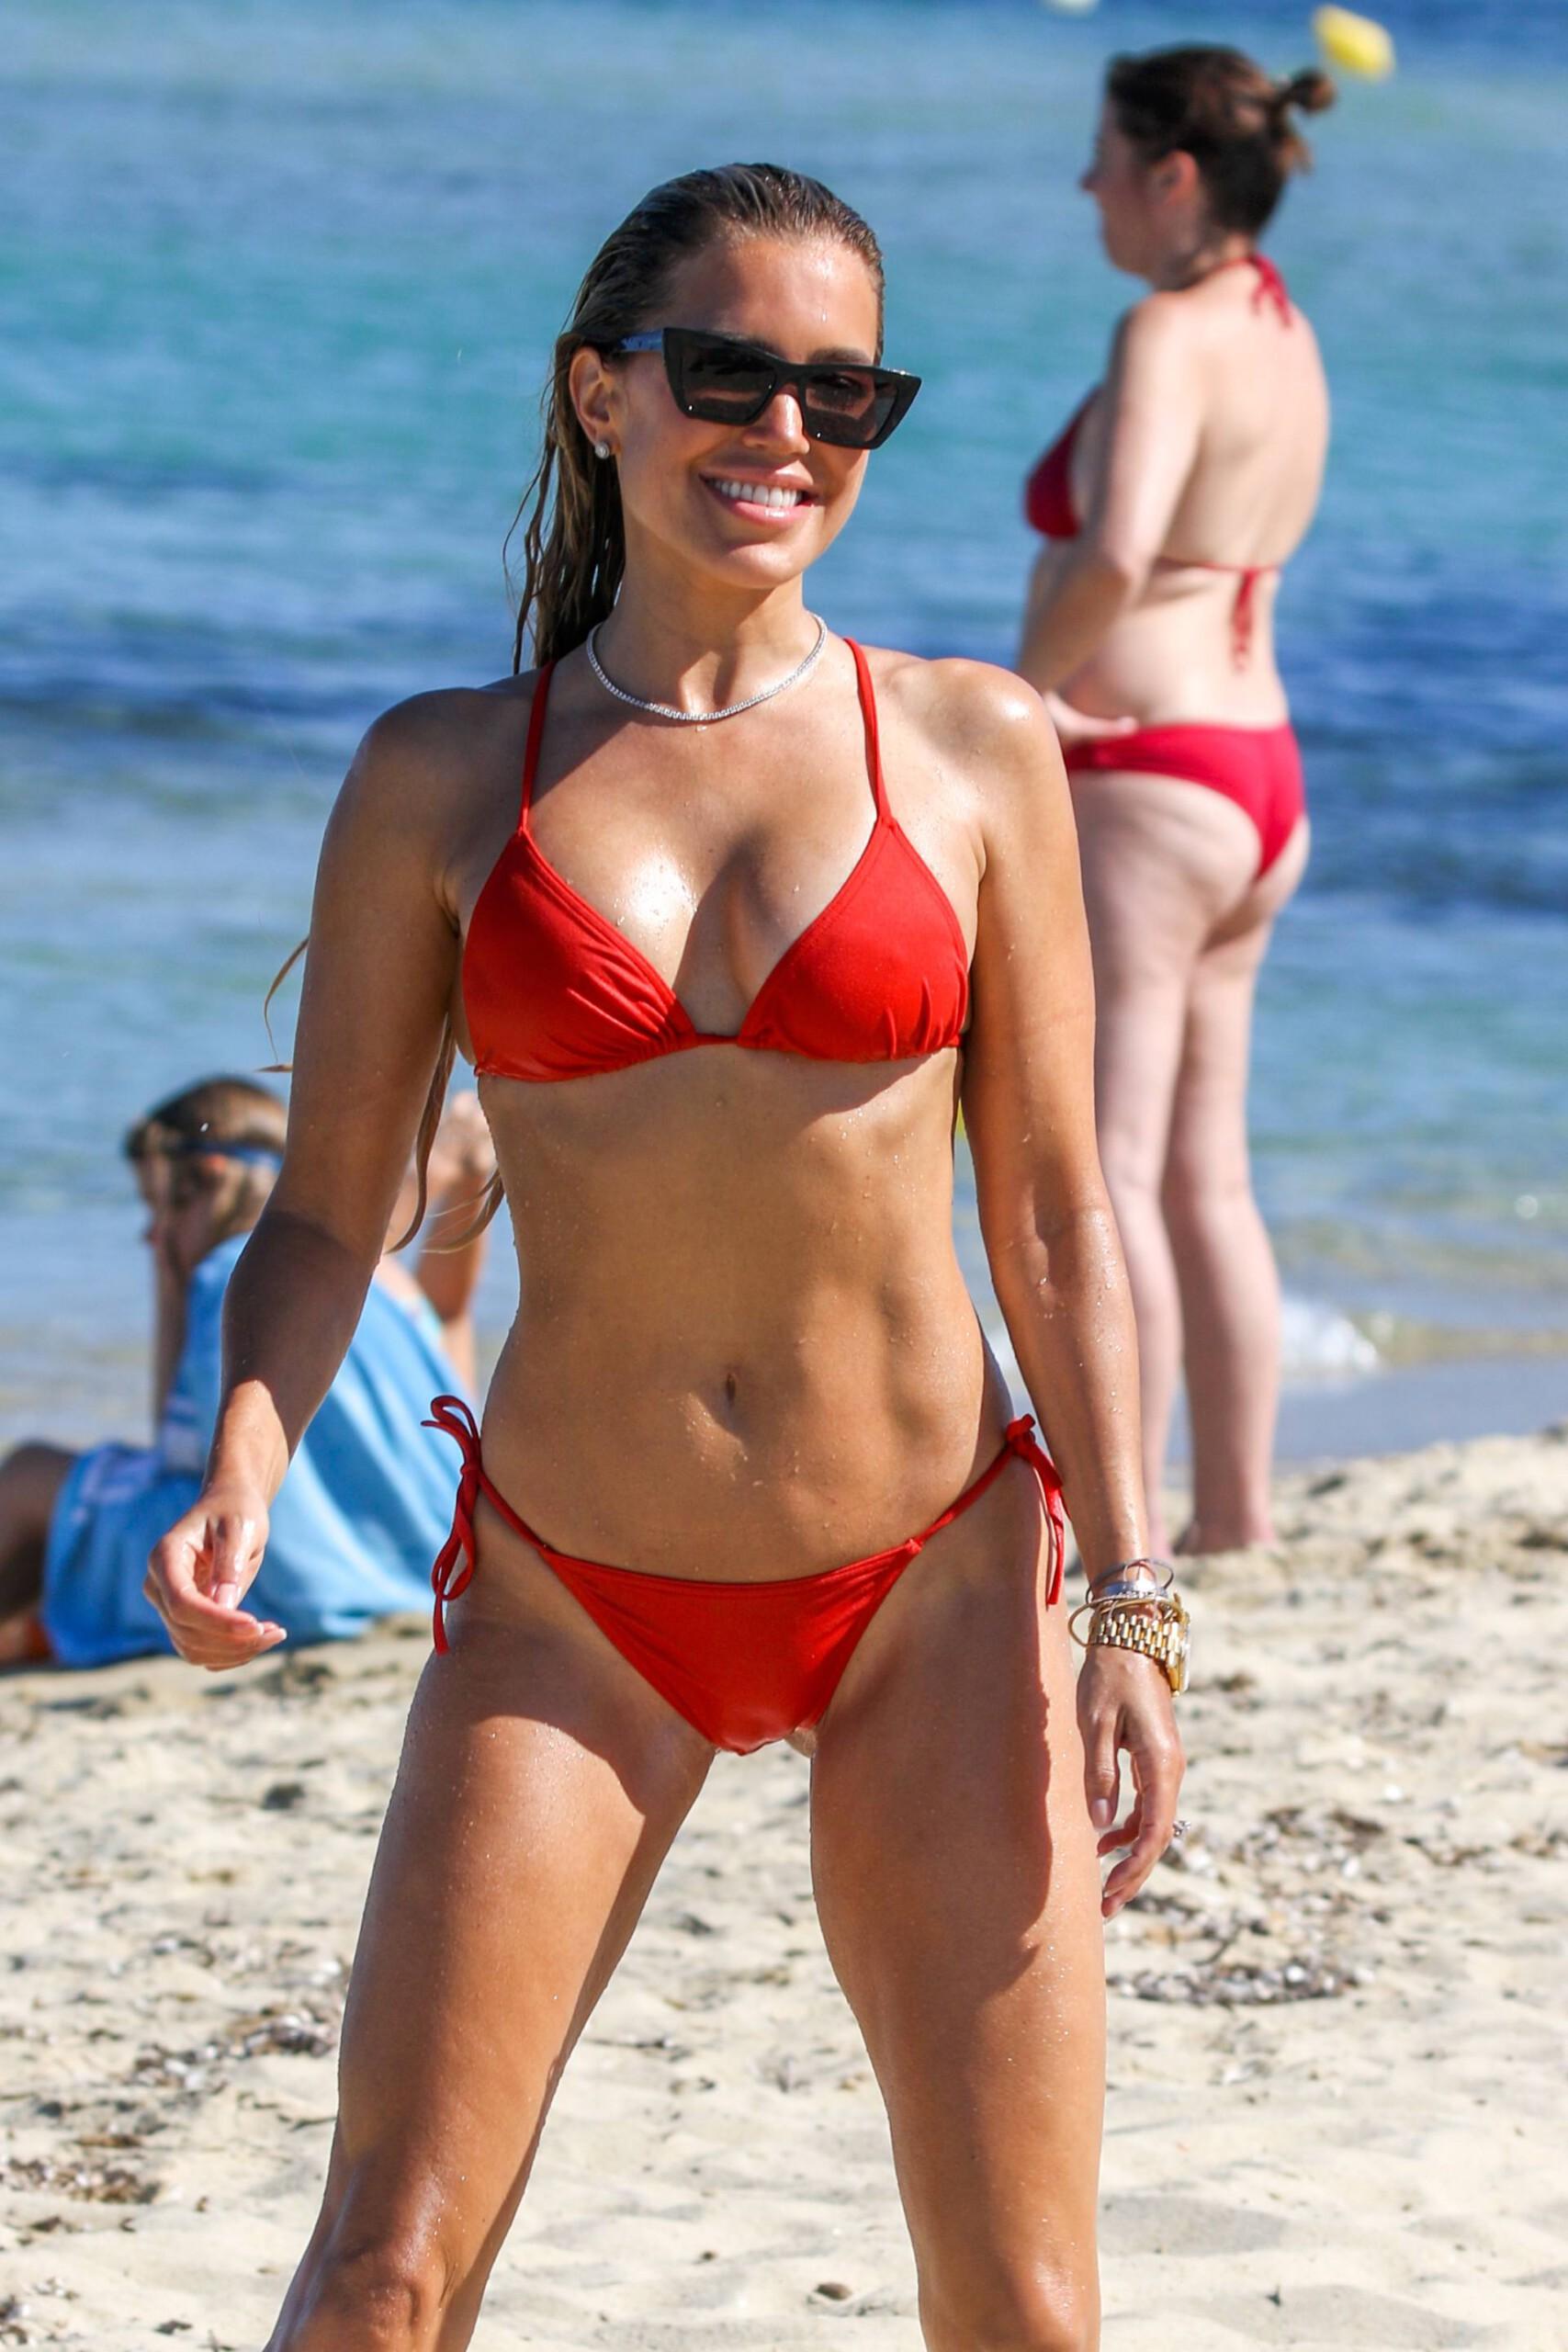 Sylvie Meis – Beautiful Body In Sexy Bikini On The Beach In Saint Tropez 0022